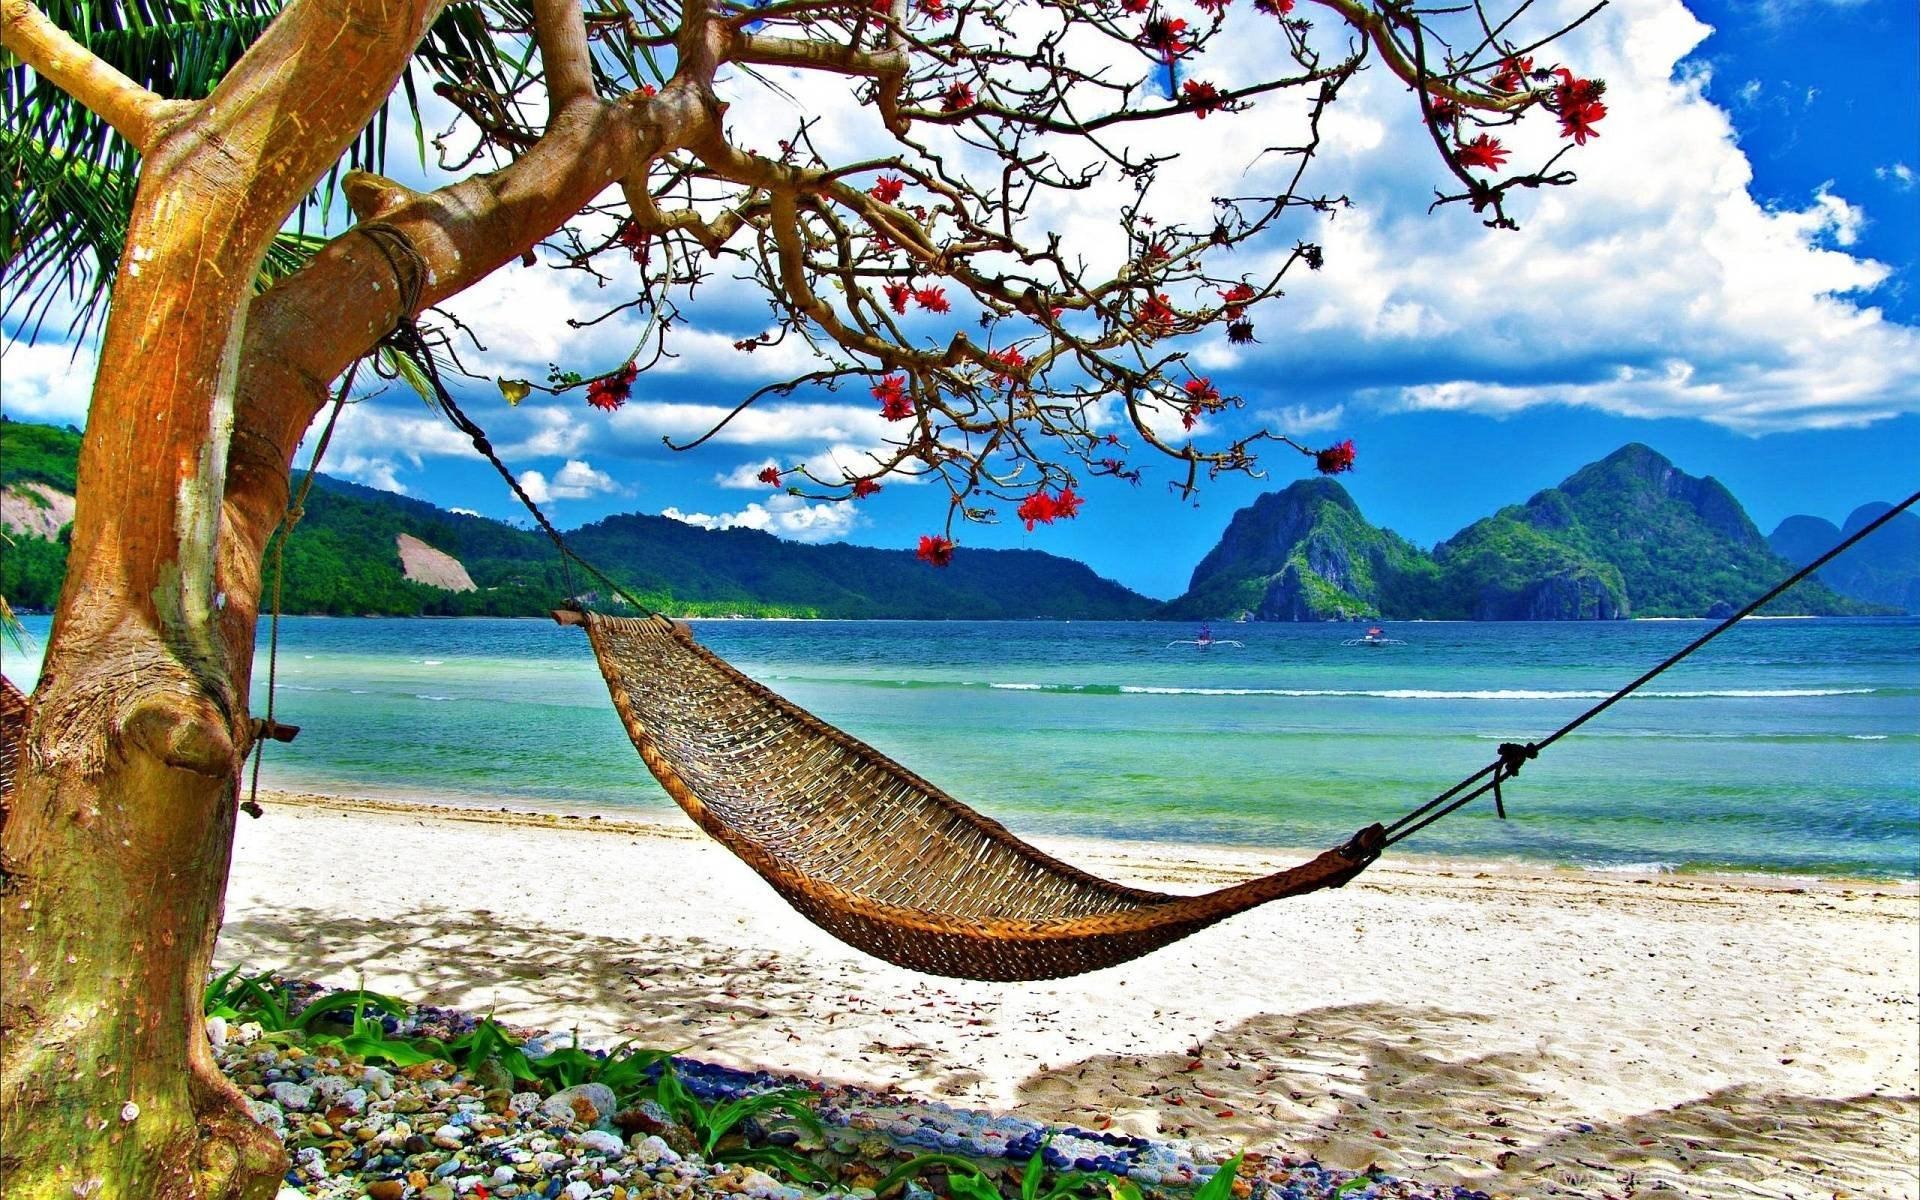 Beach Hd Wallpapers 1080p For Desktop Desktop Background